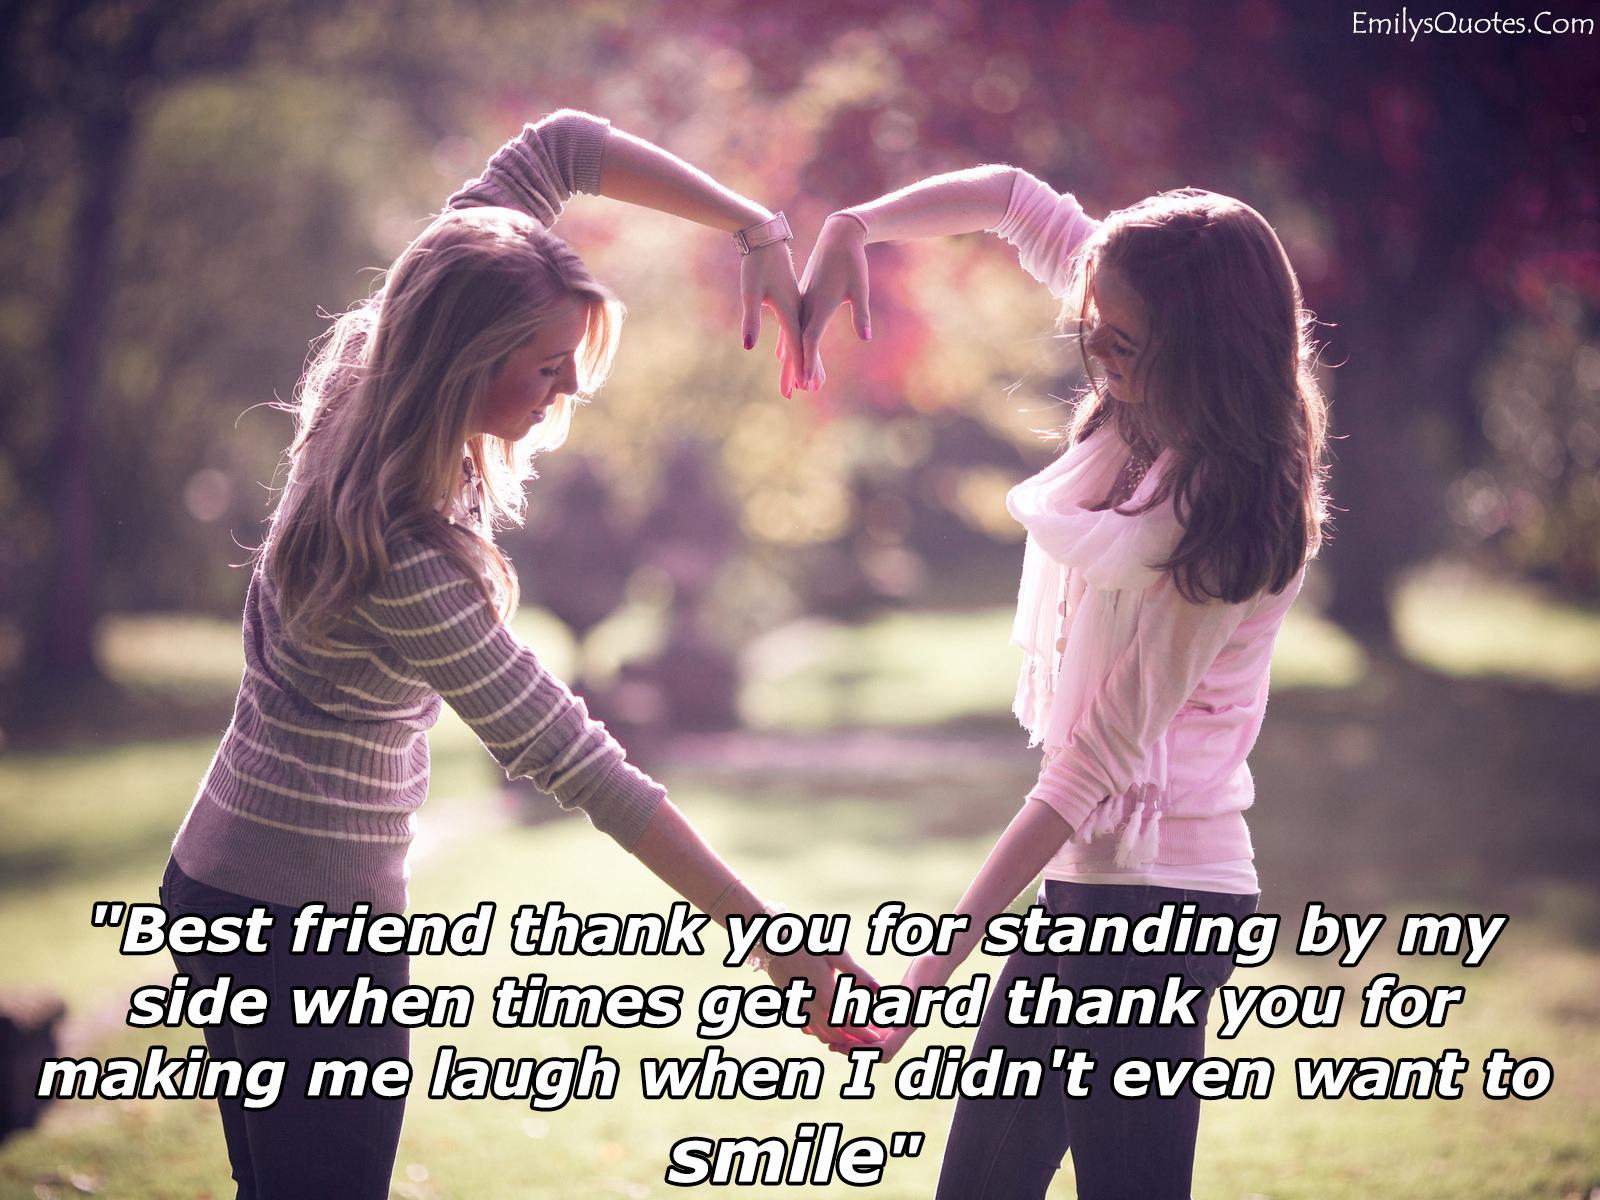 EmilysQuotes.Com - positive, friendship, relationship